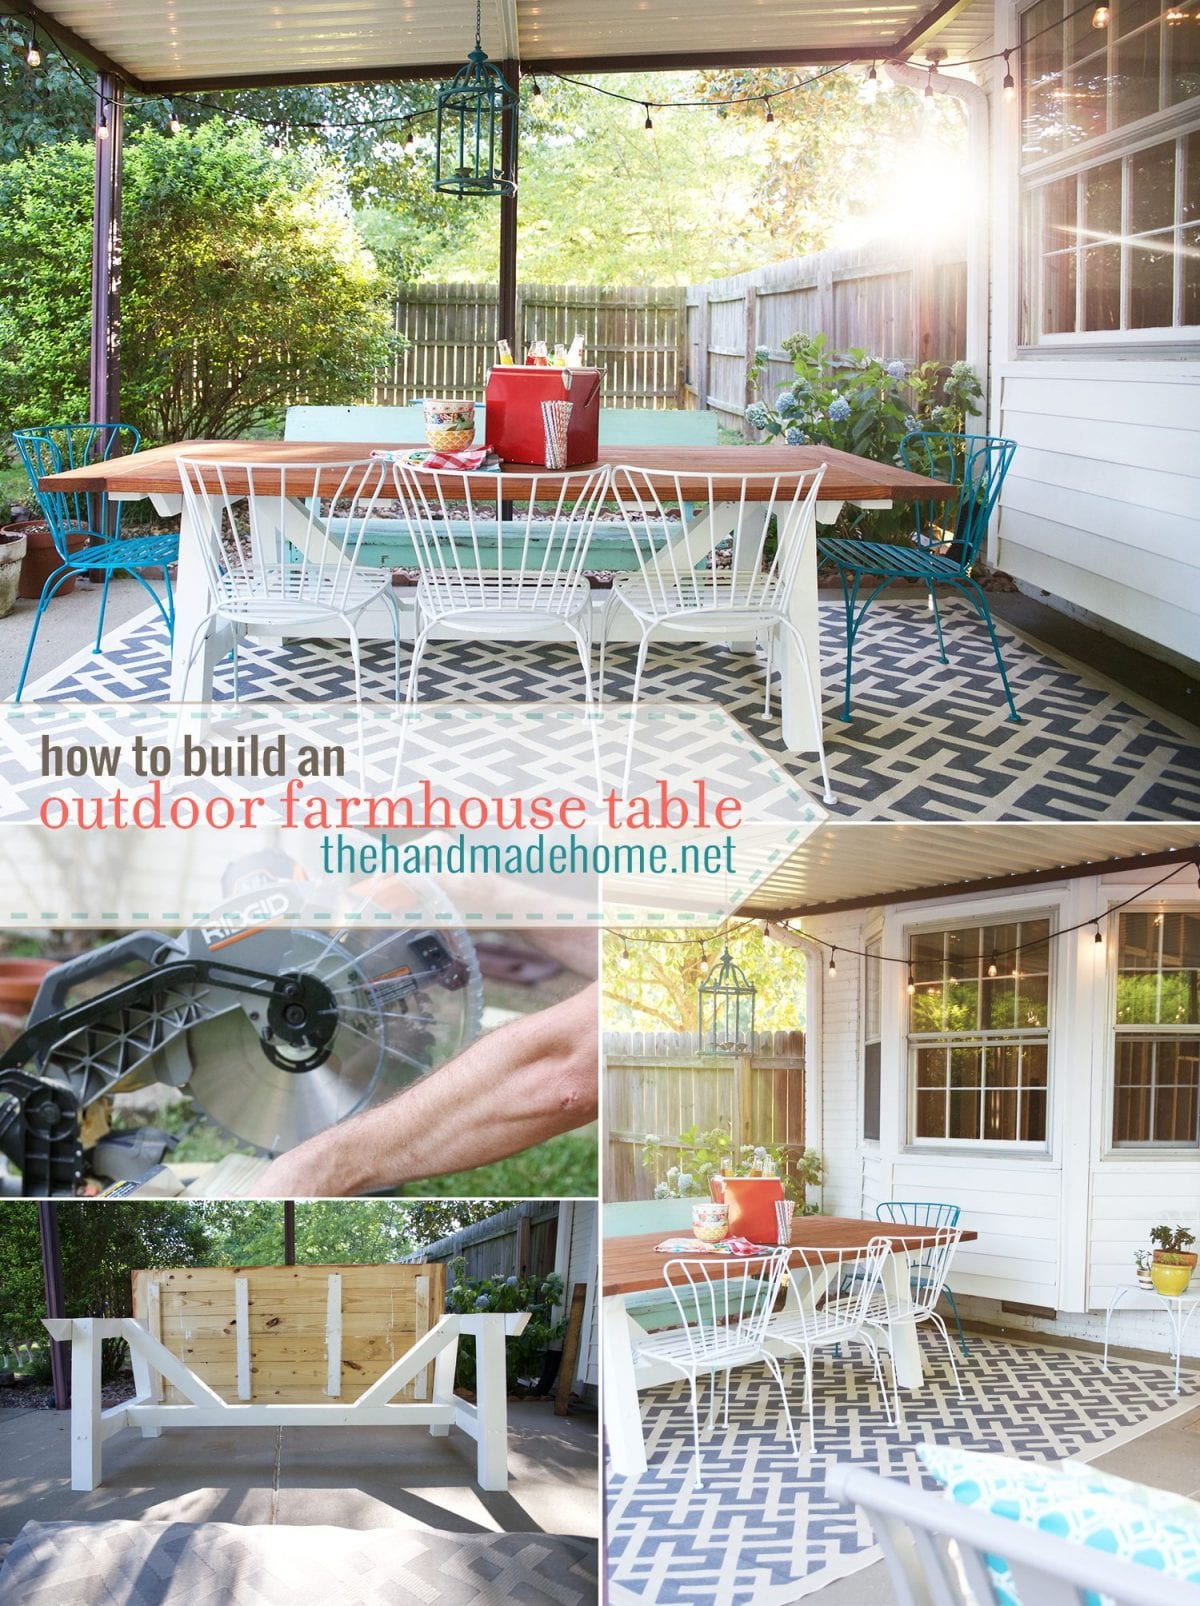 how_to_build_an_outdoor_farmhouse_table